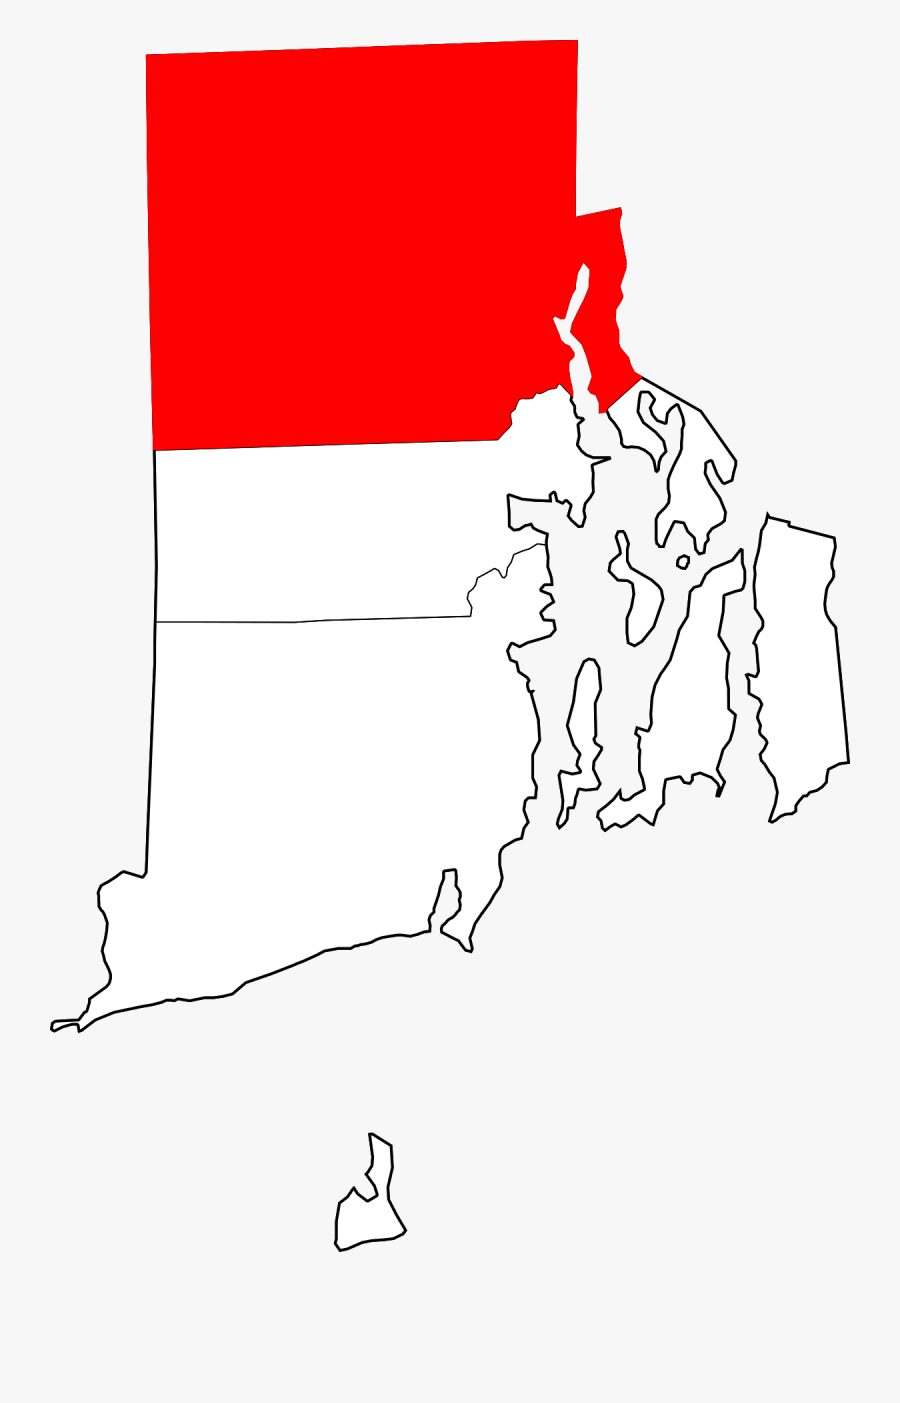 Farming Clipart Colony Rhode Island - Rhode Island Map, Transparent Clipart